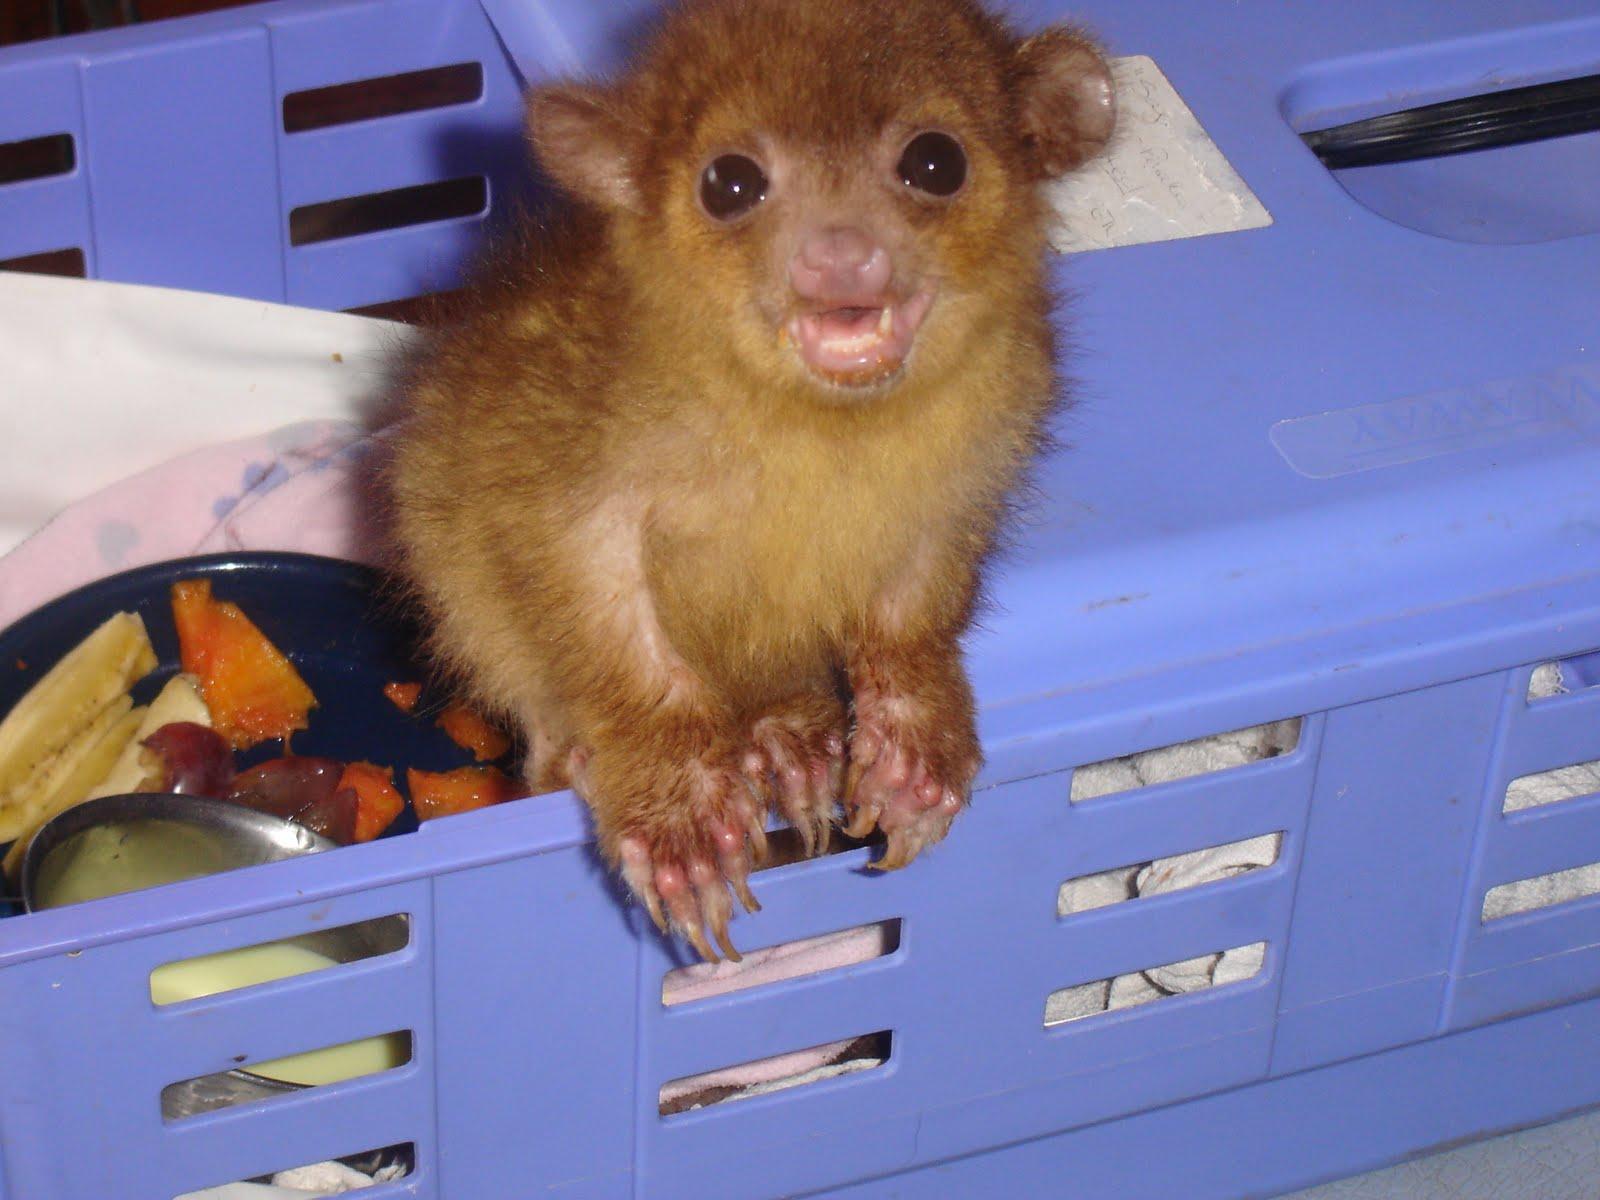 Pin Kinkajous Pets Cages on Pinterest